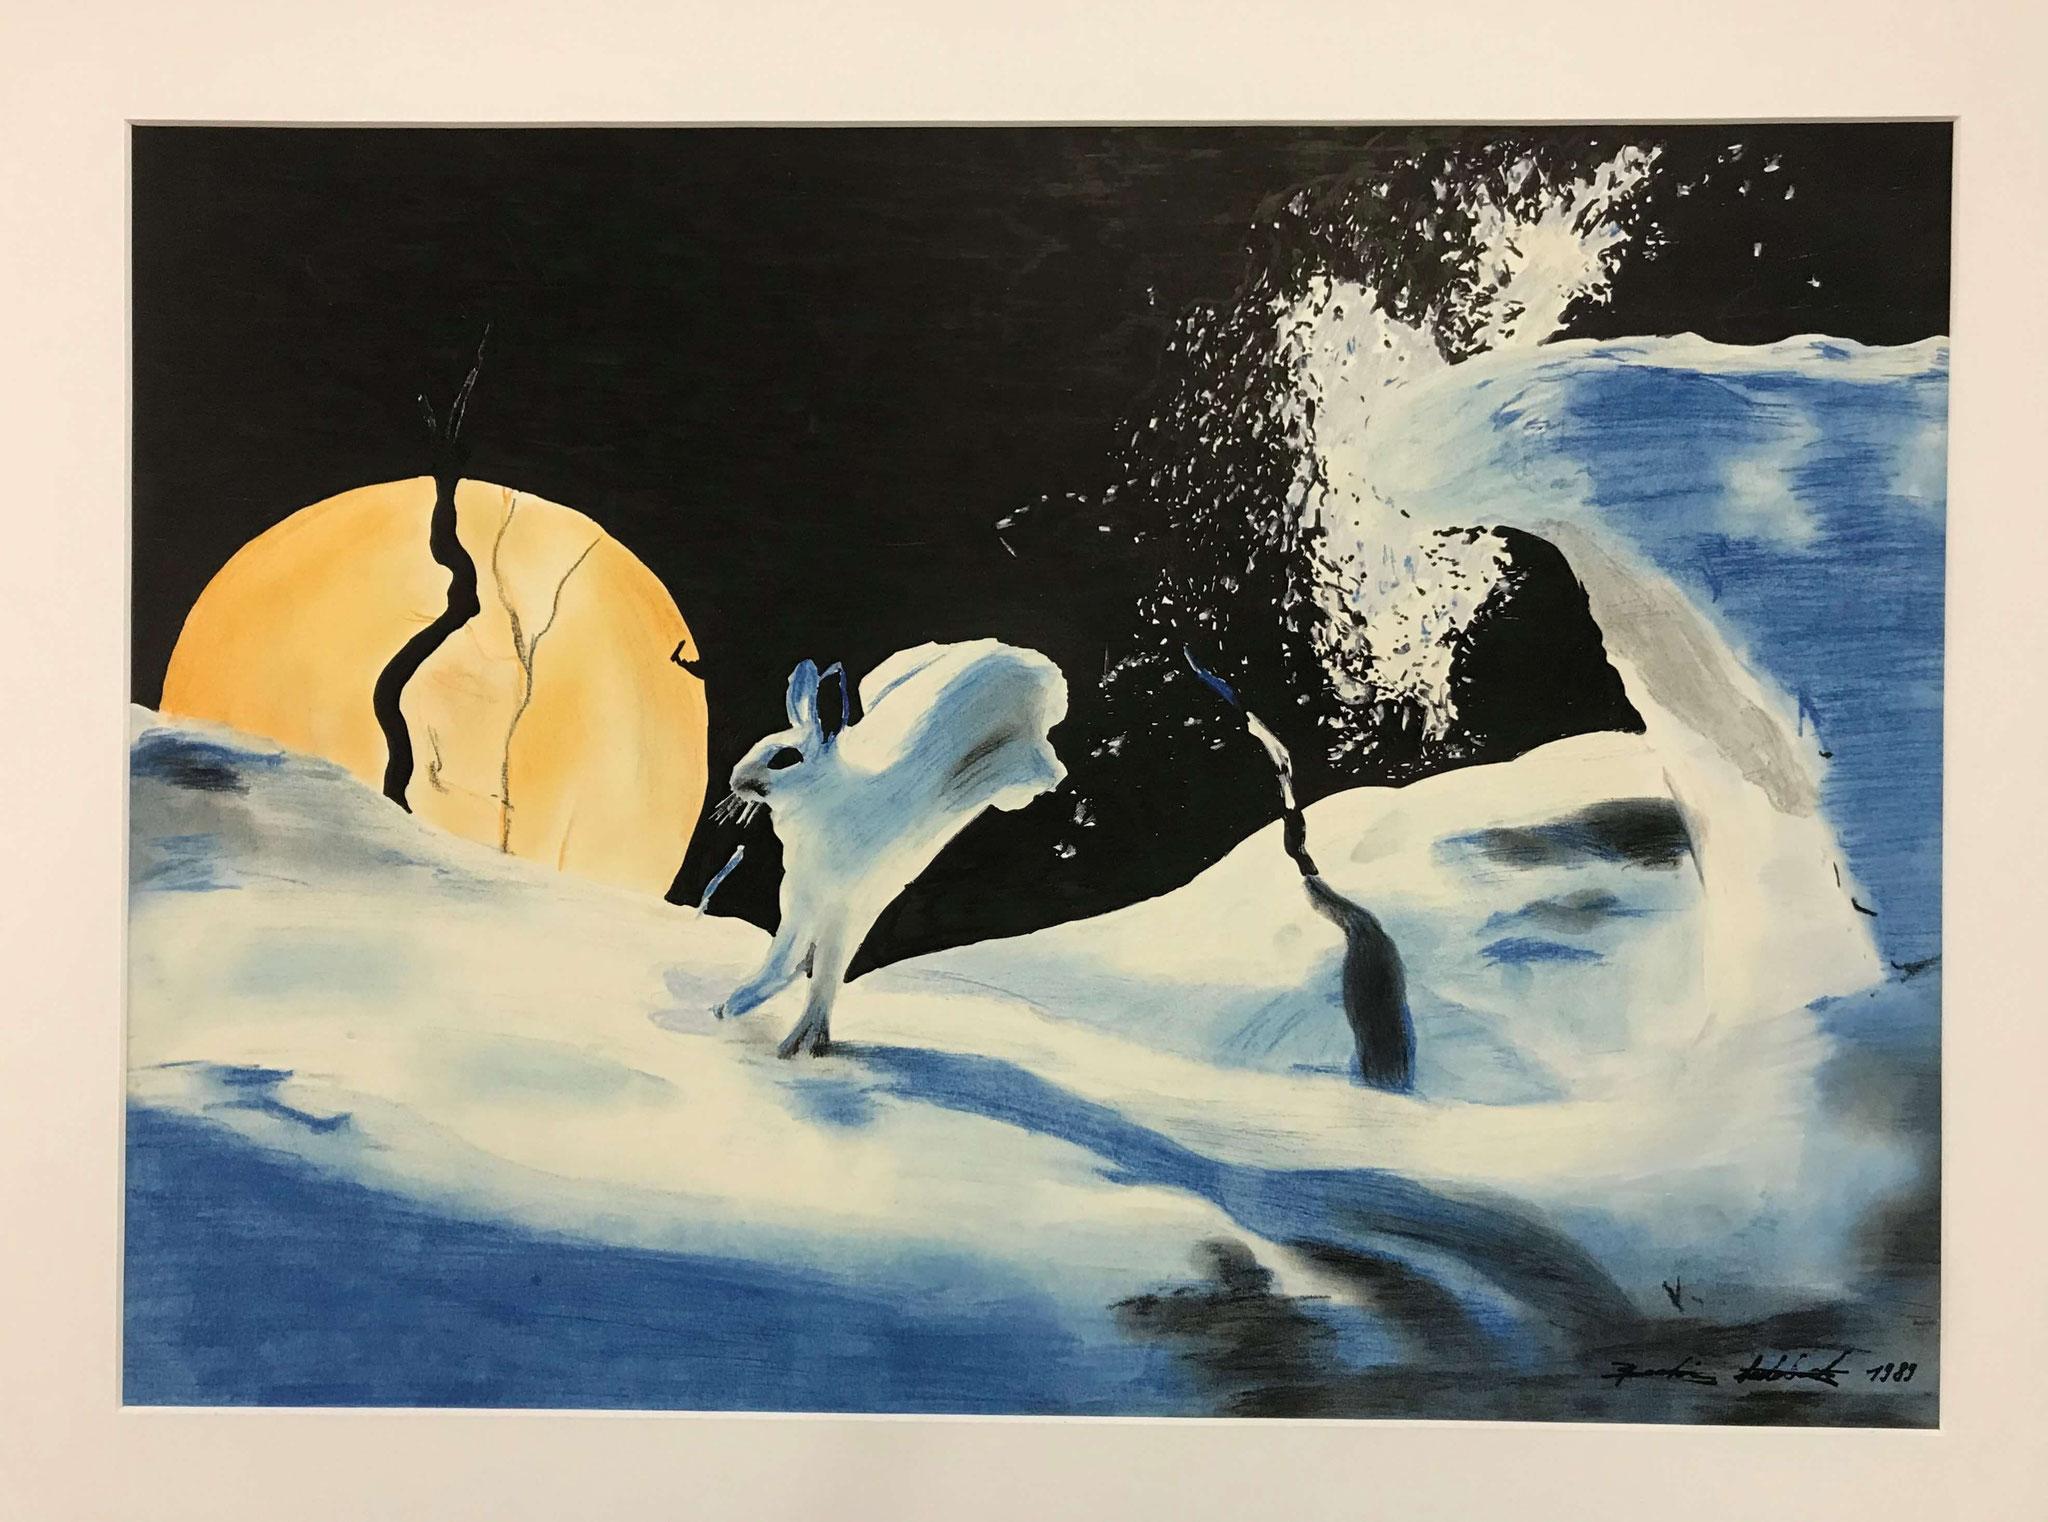 Fr. 350.00 Beatrice Subieck, Farbstifte auf Papier 65 x 52 cm.